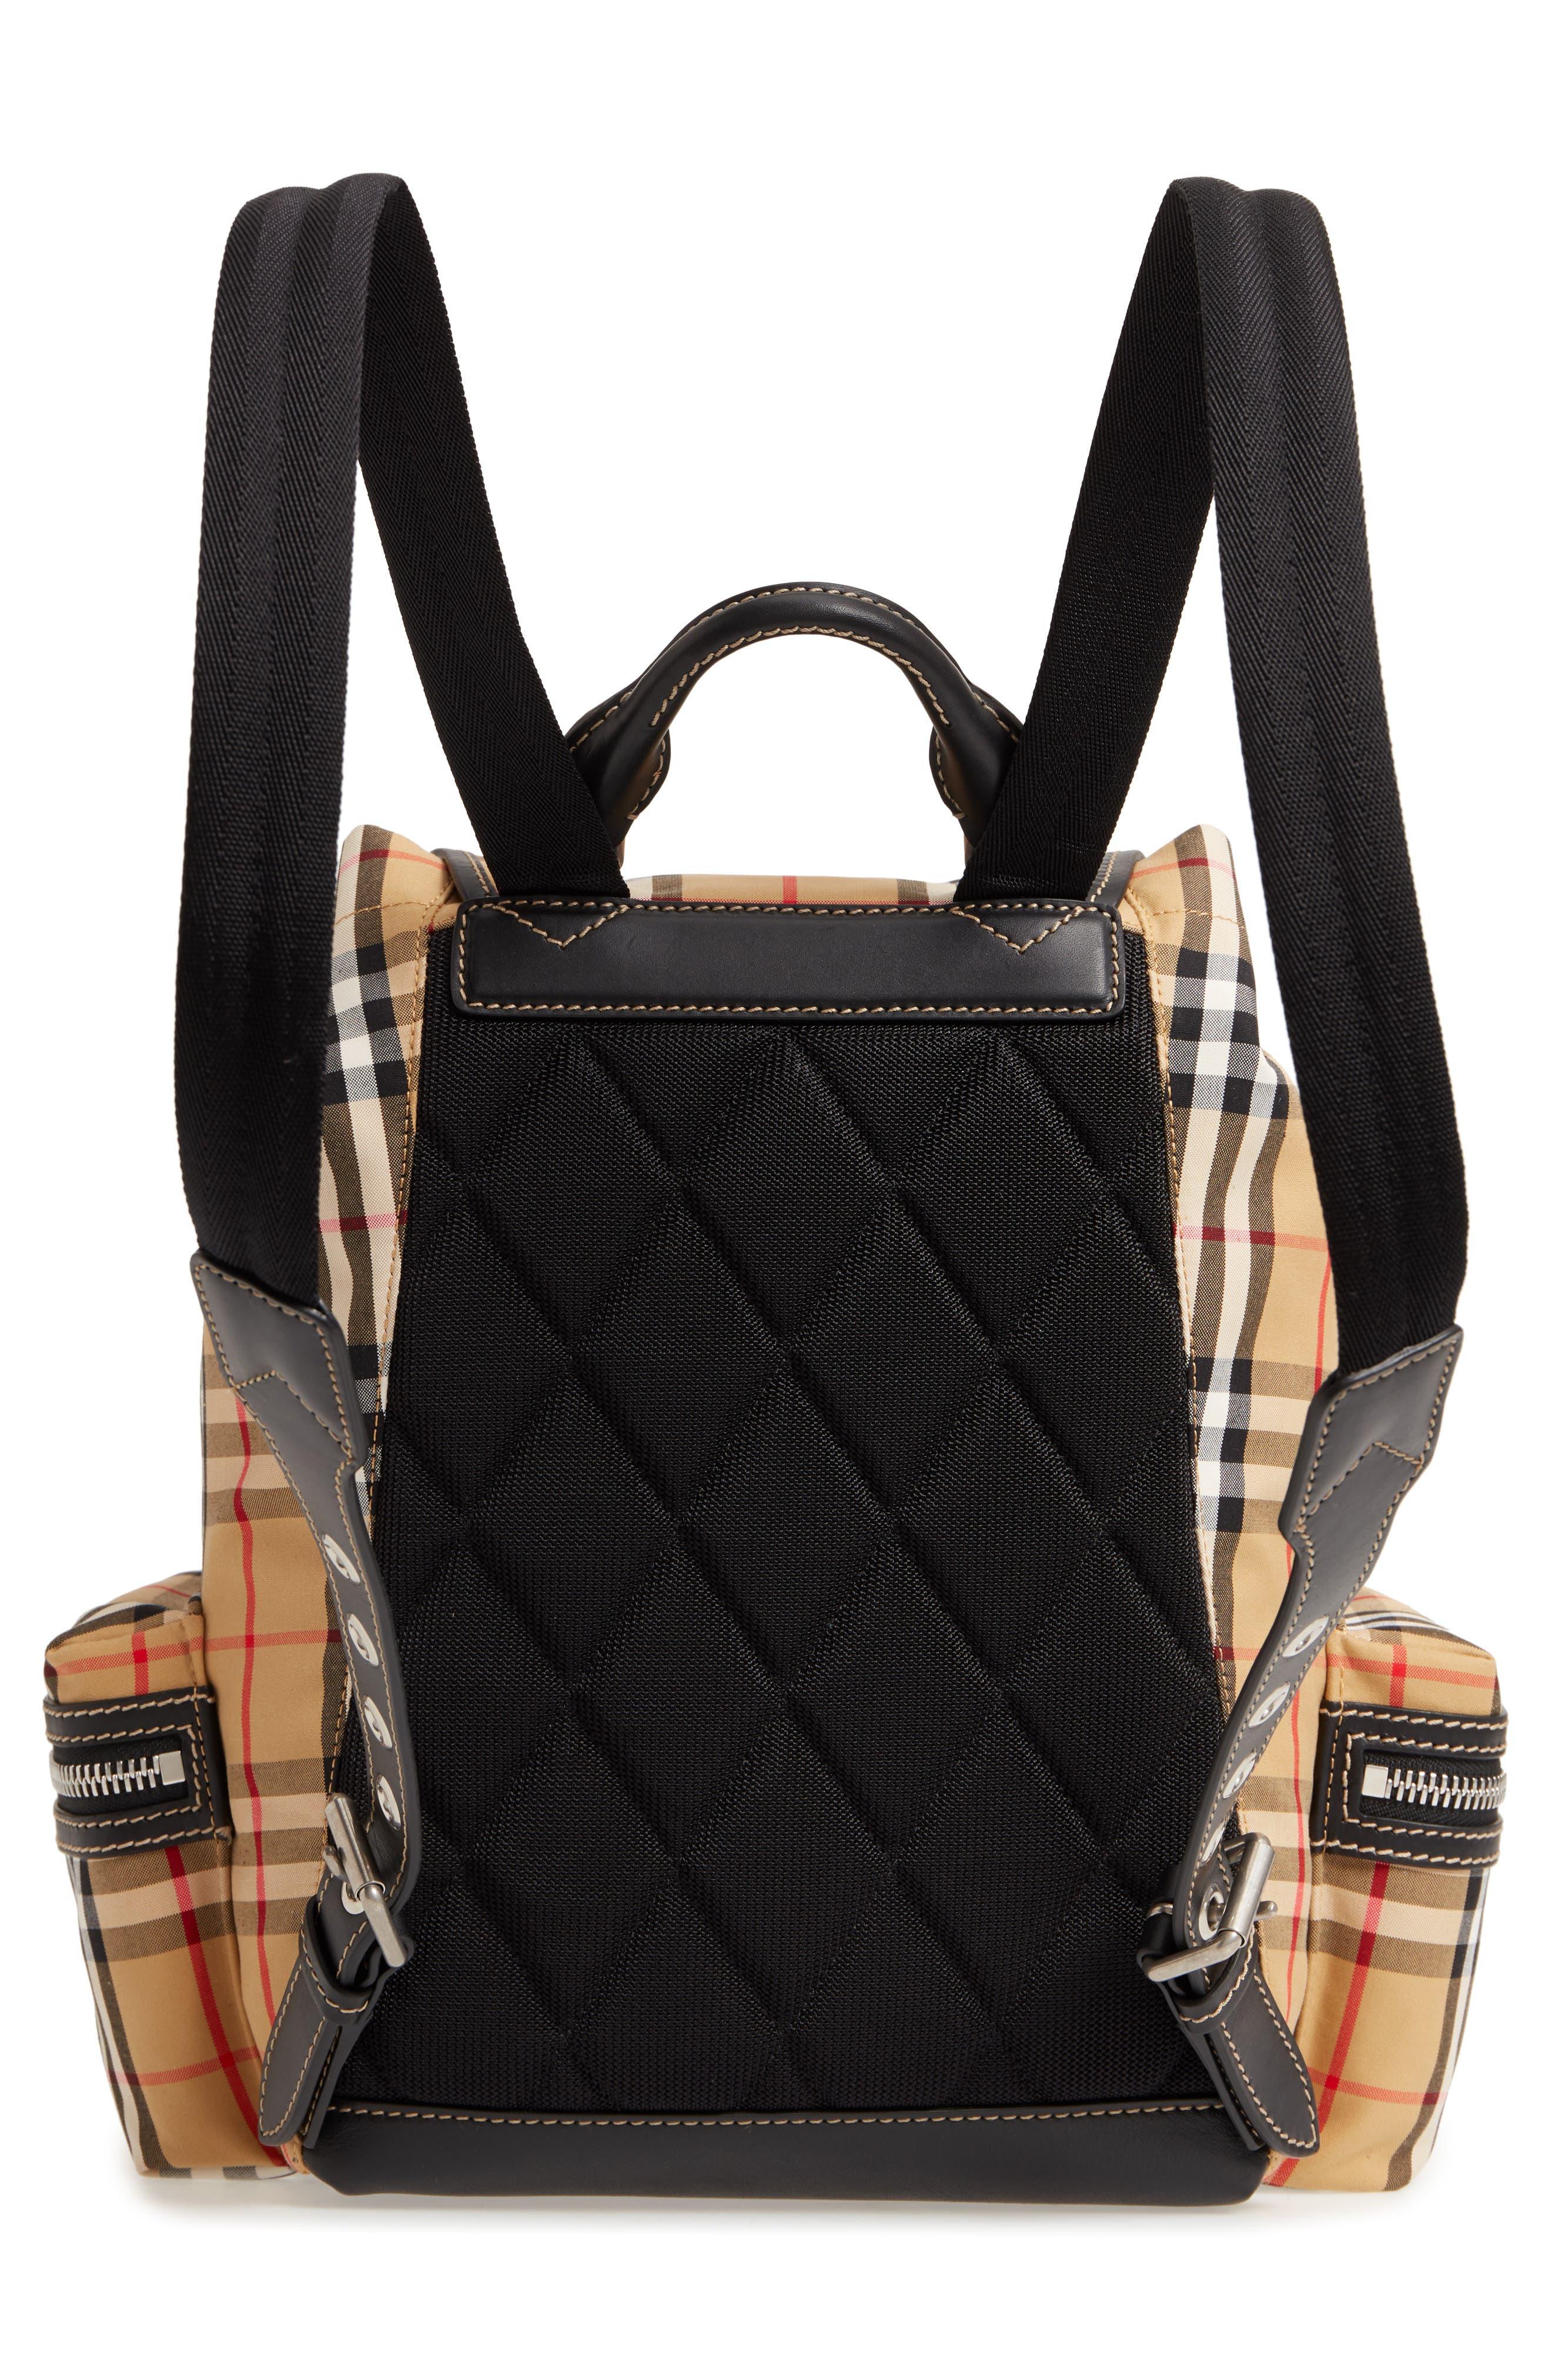 Medium Rucksack Check Cotton Backpack,                             Alternate thumbnail 3, color,                             ANTIQUE YELLOW